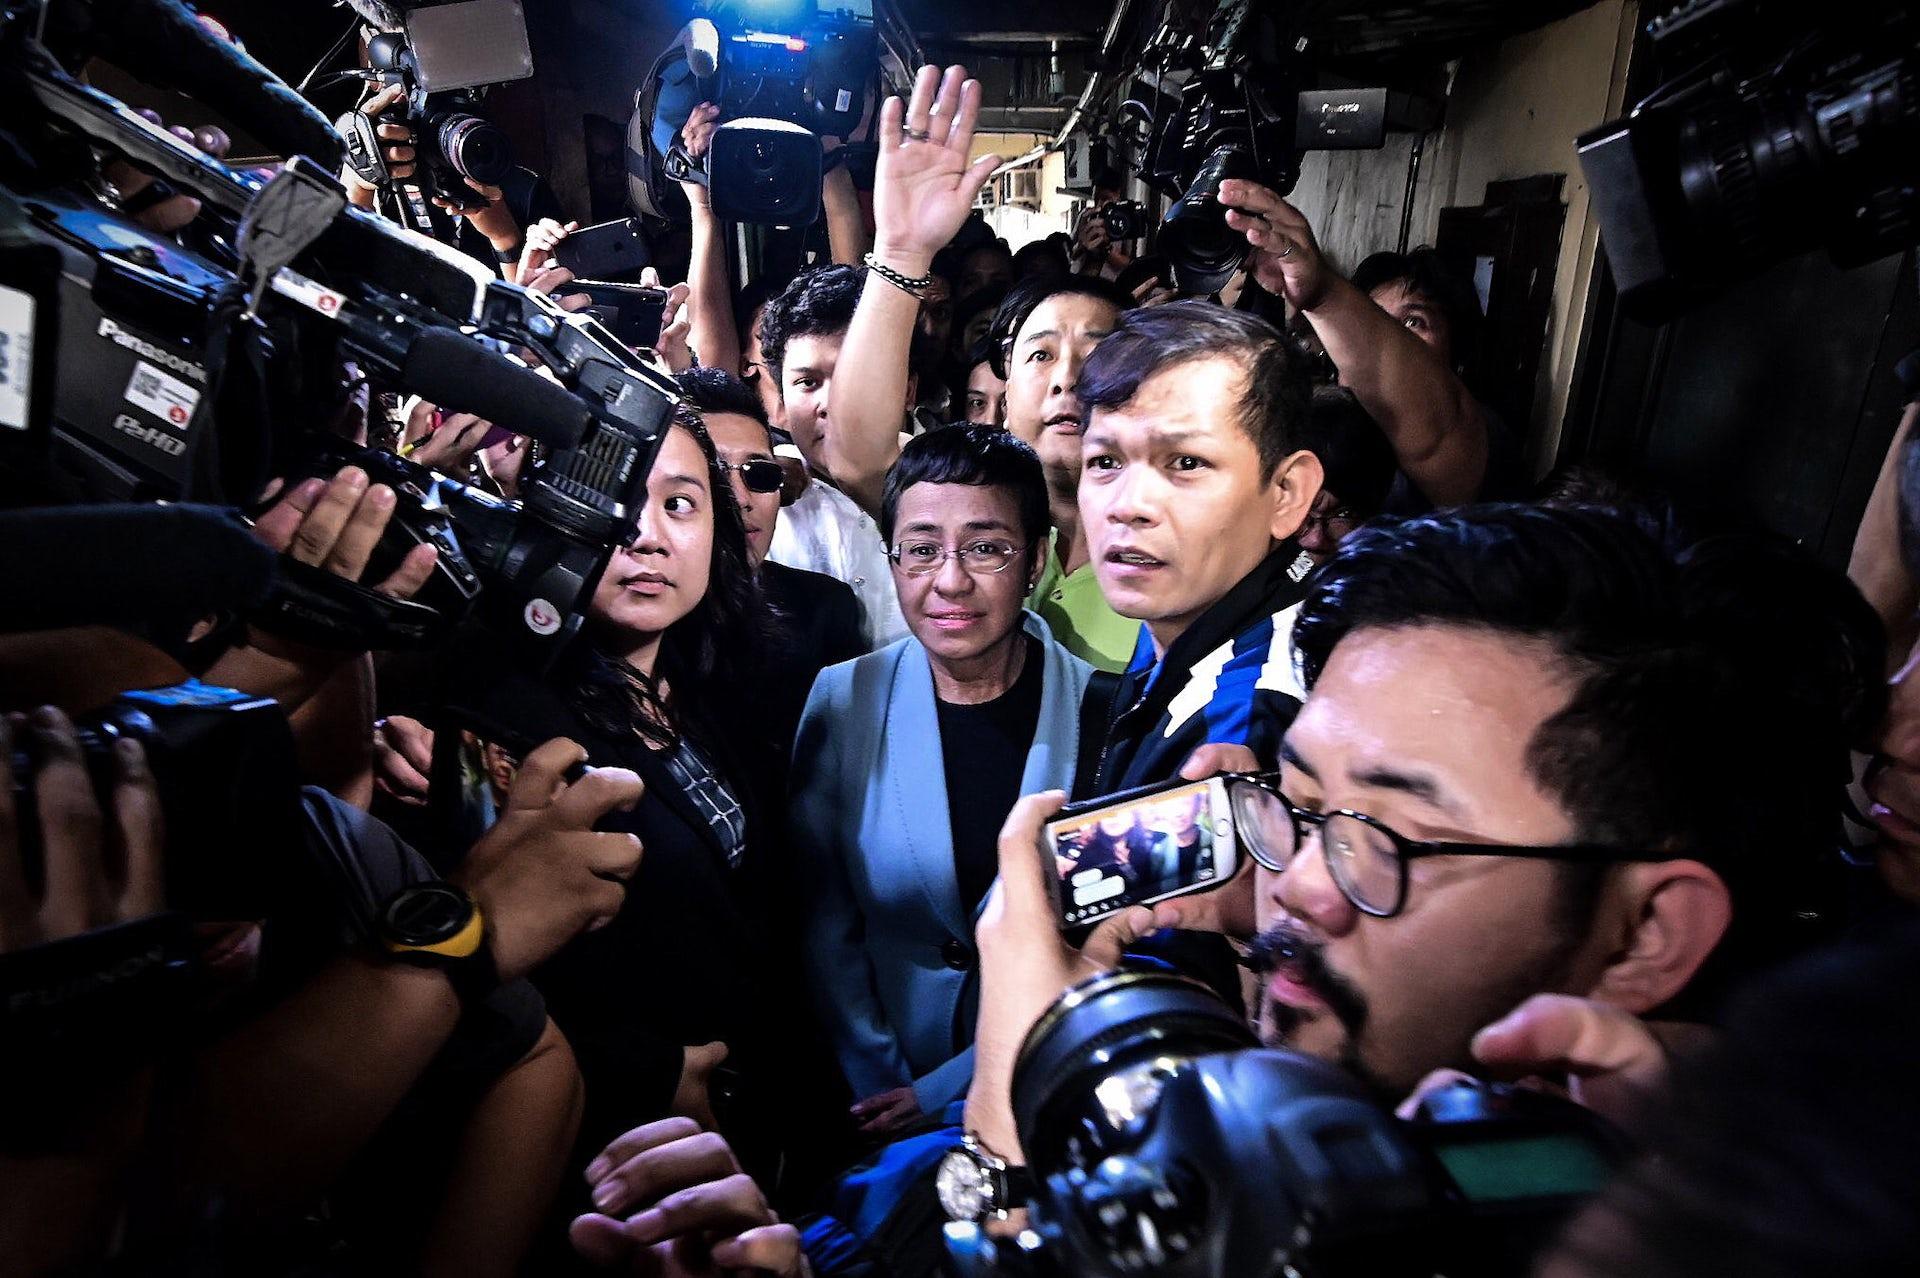 Press freedom under attack: why Filipino journalist Maria Ressa's arrest should matter to all of us